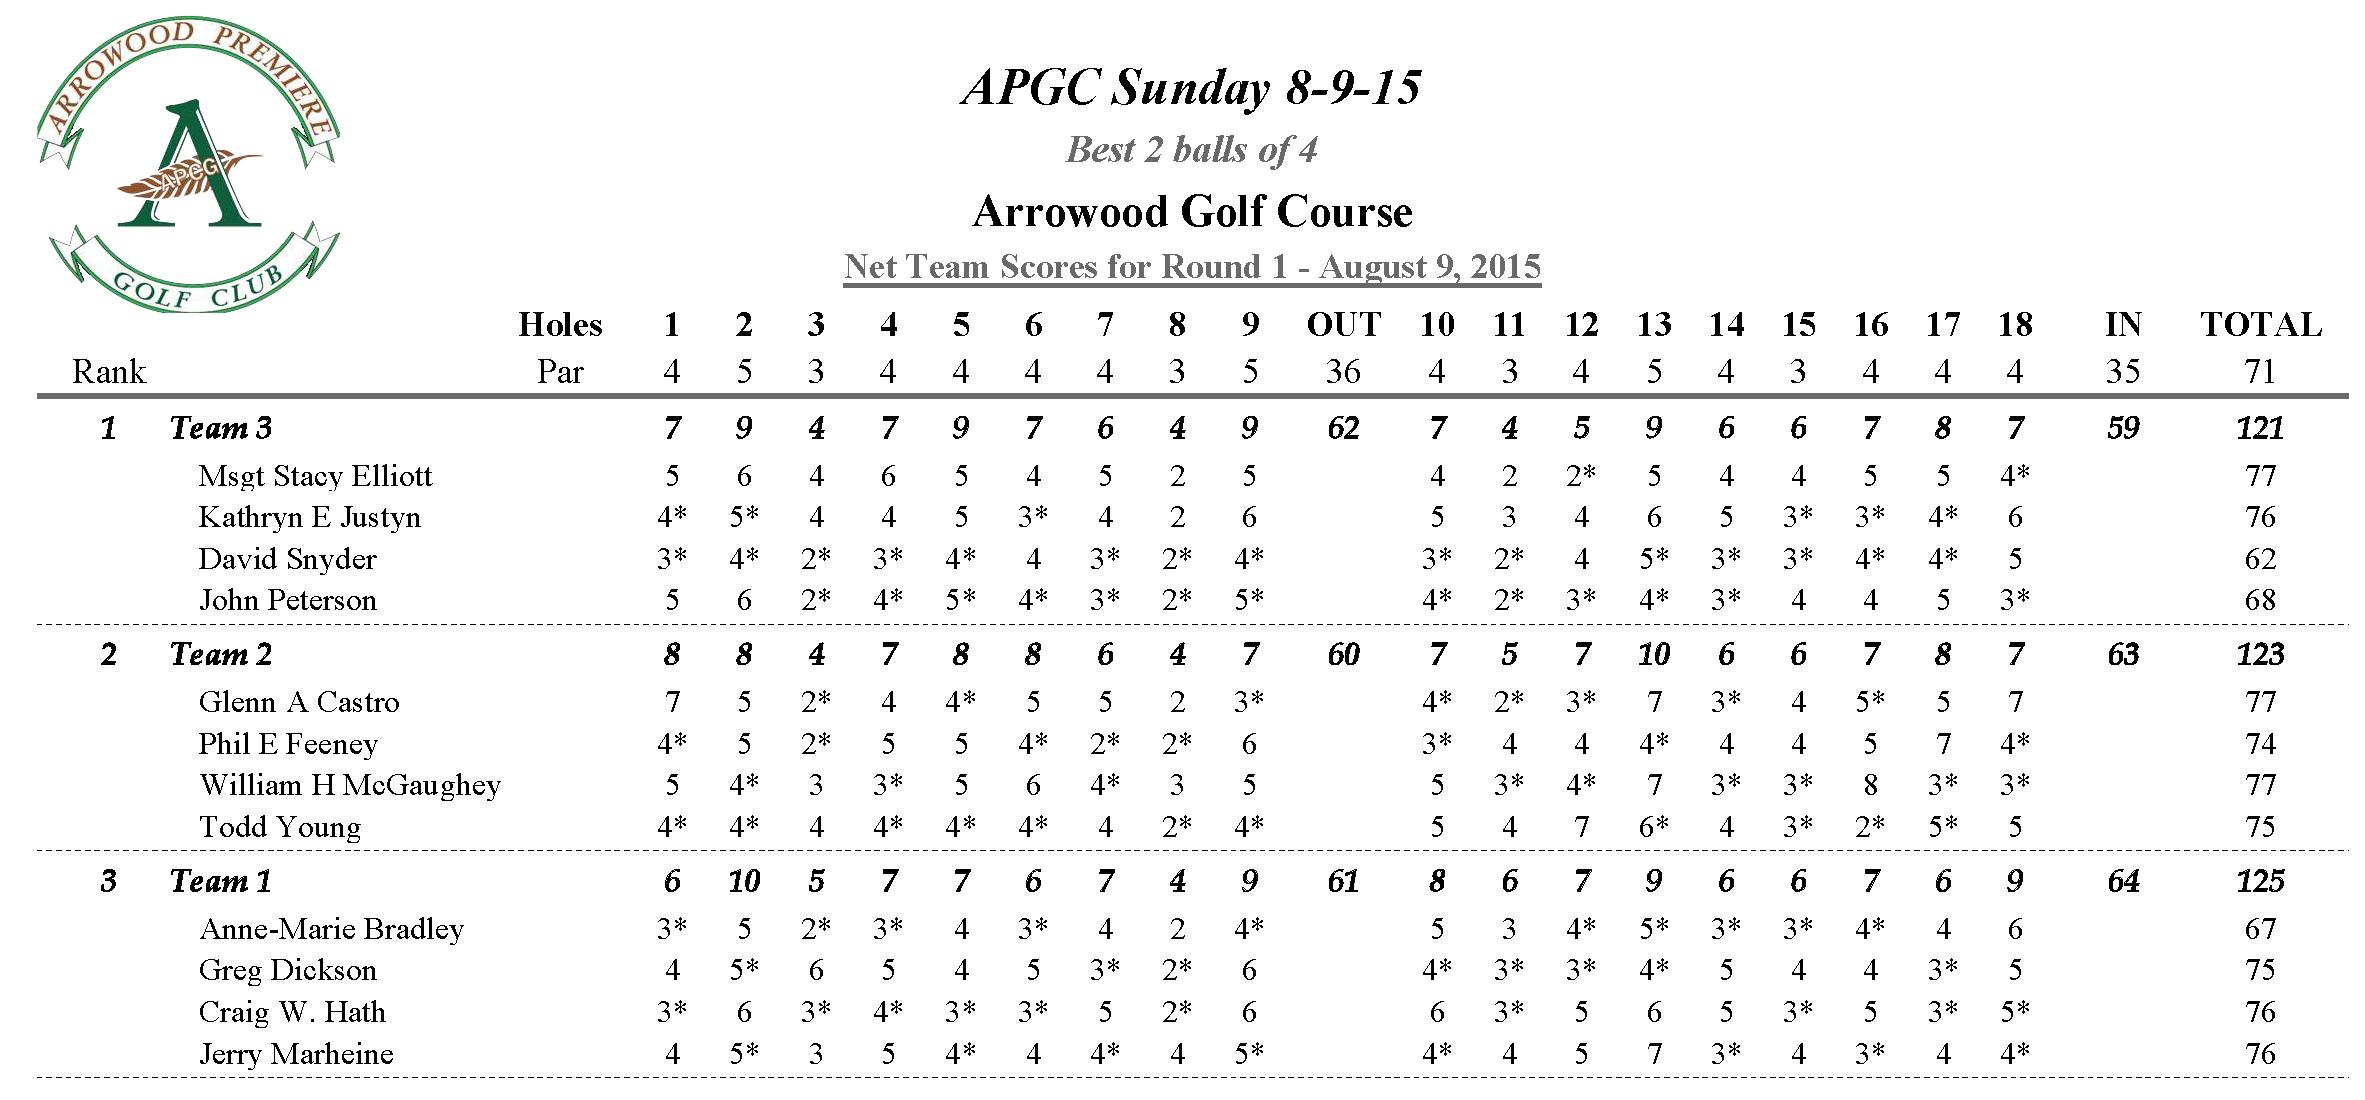 APGC Sunday 8-9-15